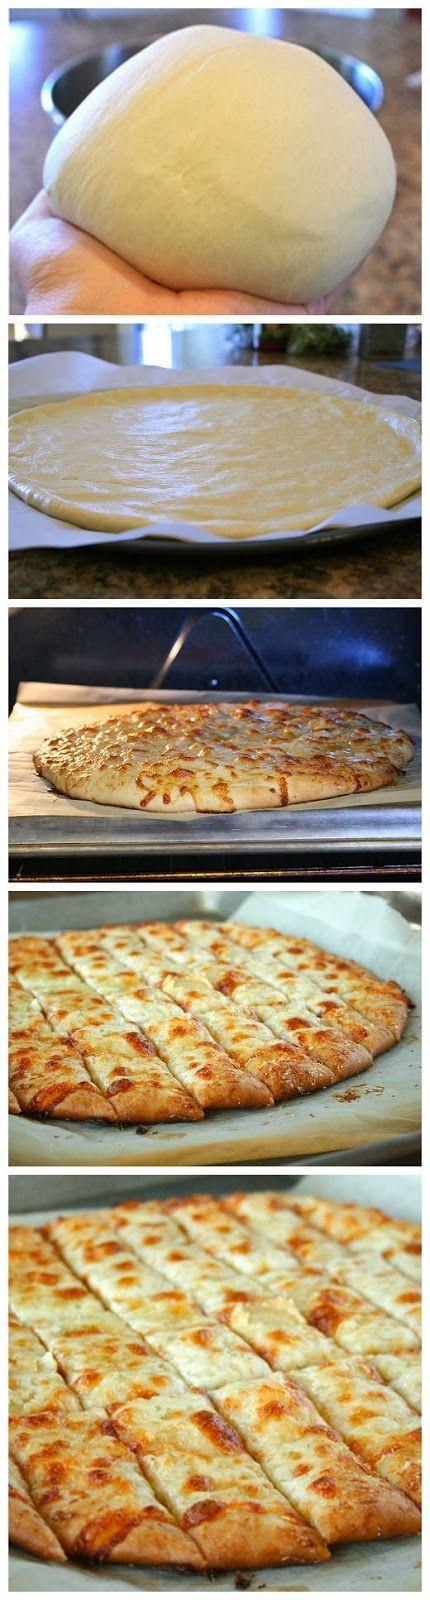 Fail-Proof Pizza Dough and Cheesy Garlic Bread Sticks